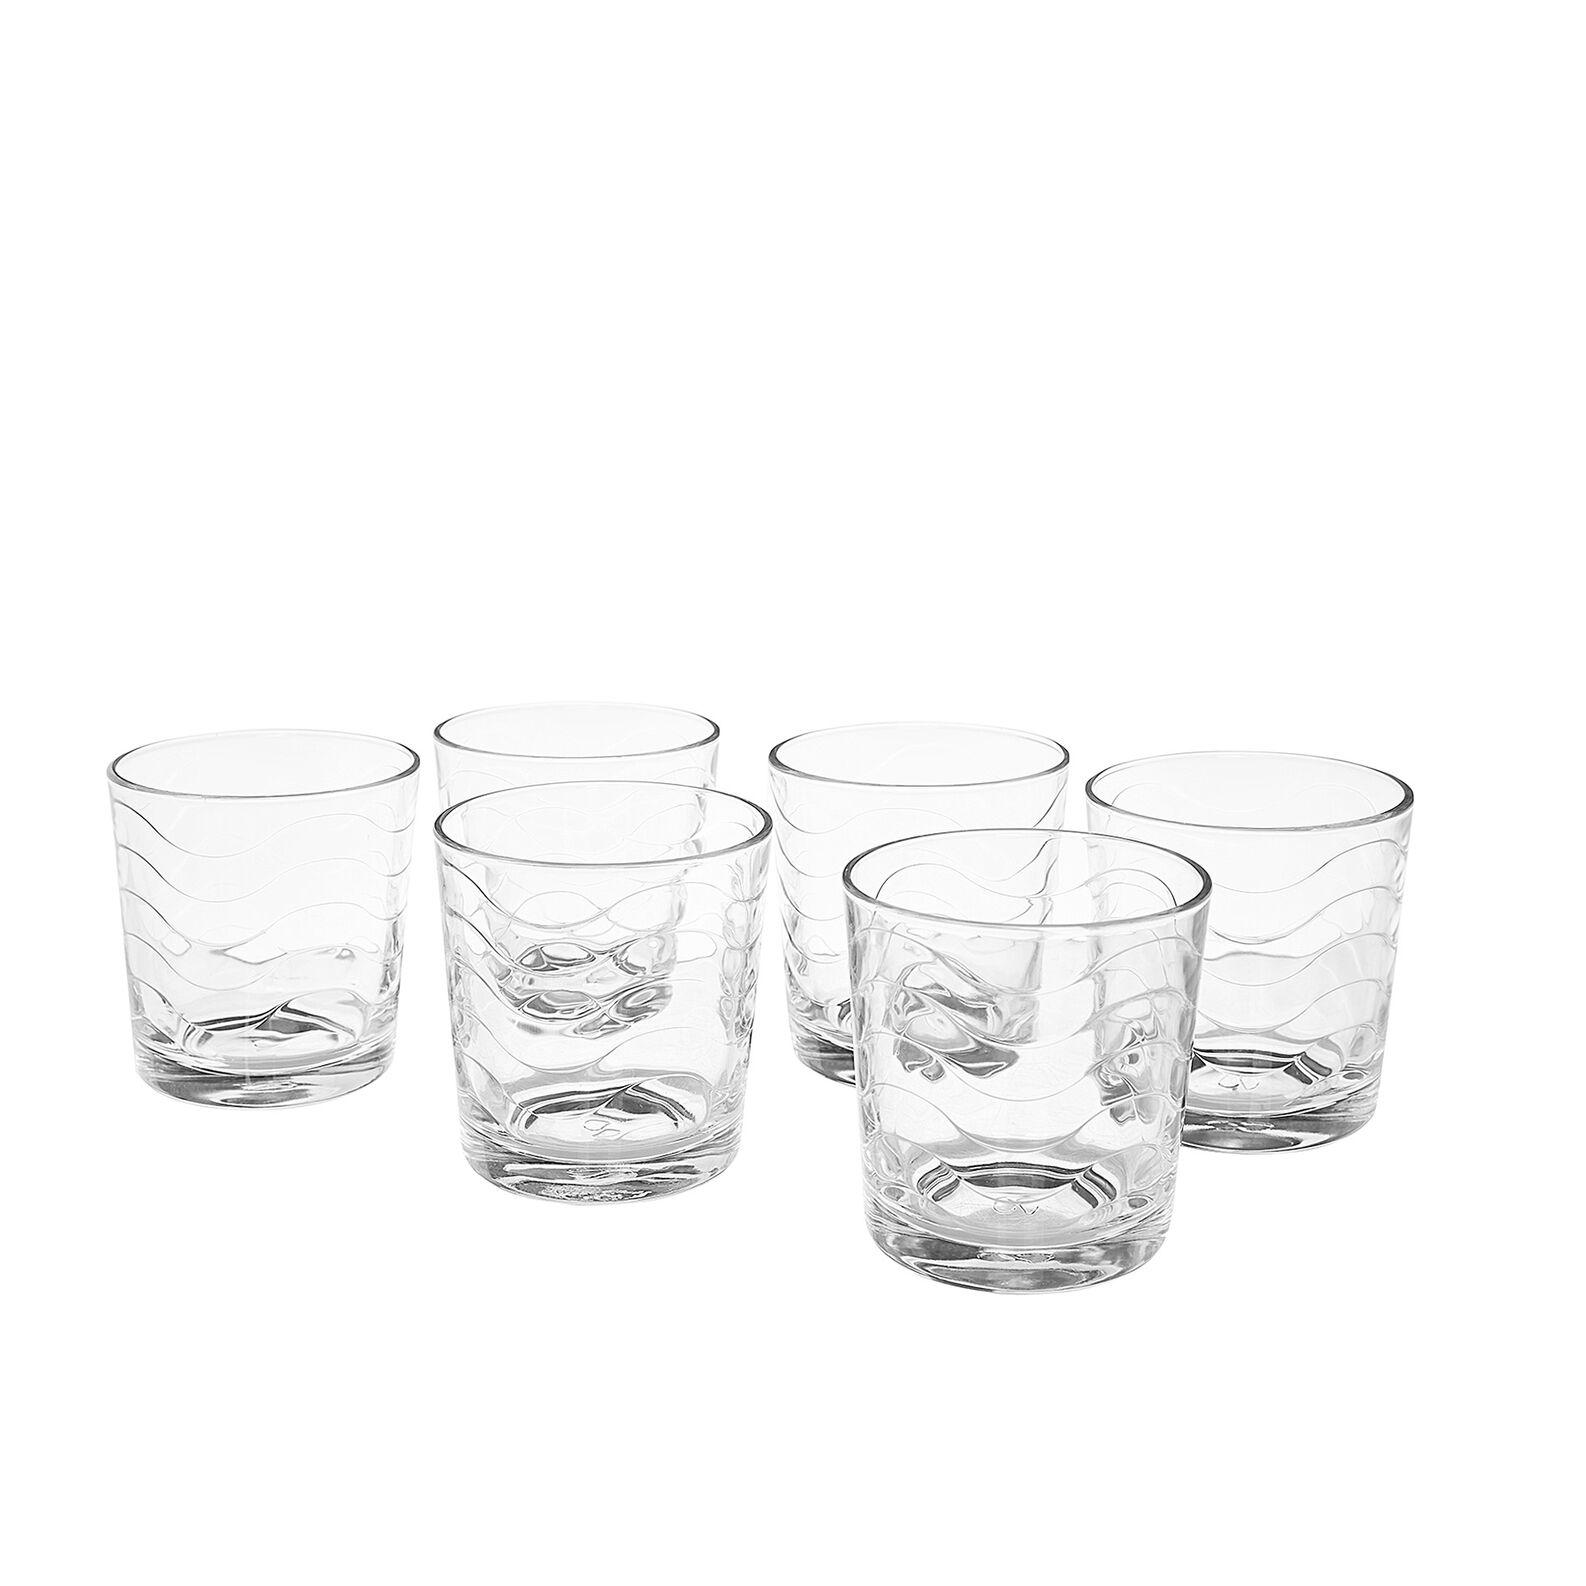 Set of 6 Toros glasses